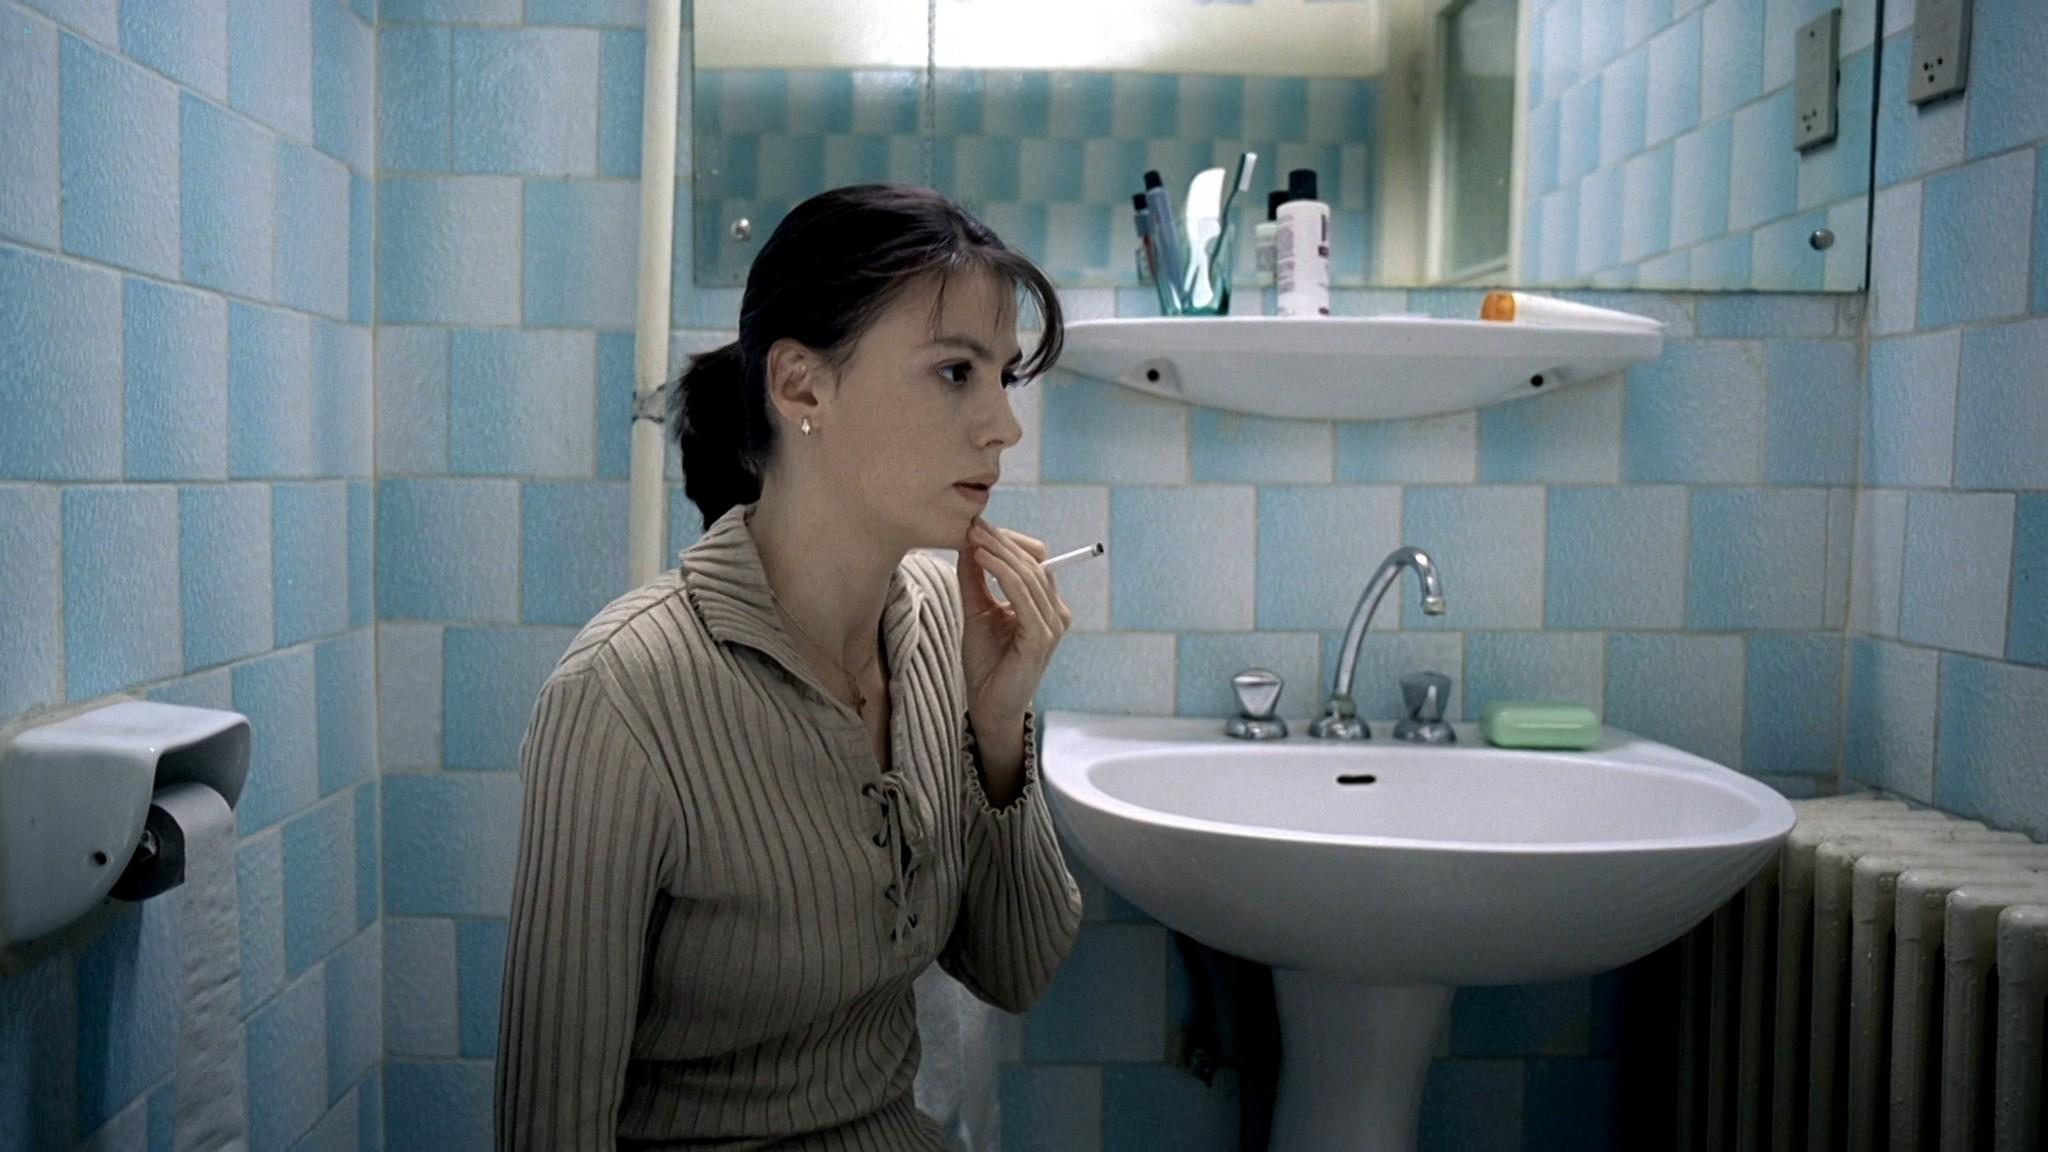 Laura Vasiliu nude bush Anamaria Marinca nude too 4 Months 3 Weeks and 2 Days RO 2007 1080p BluRay 005